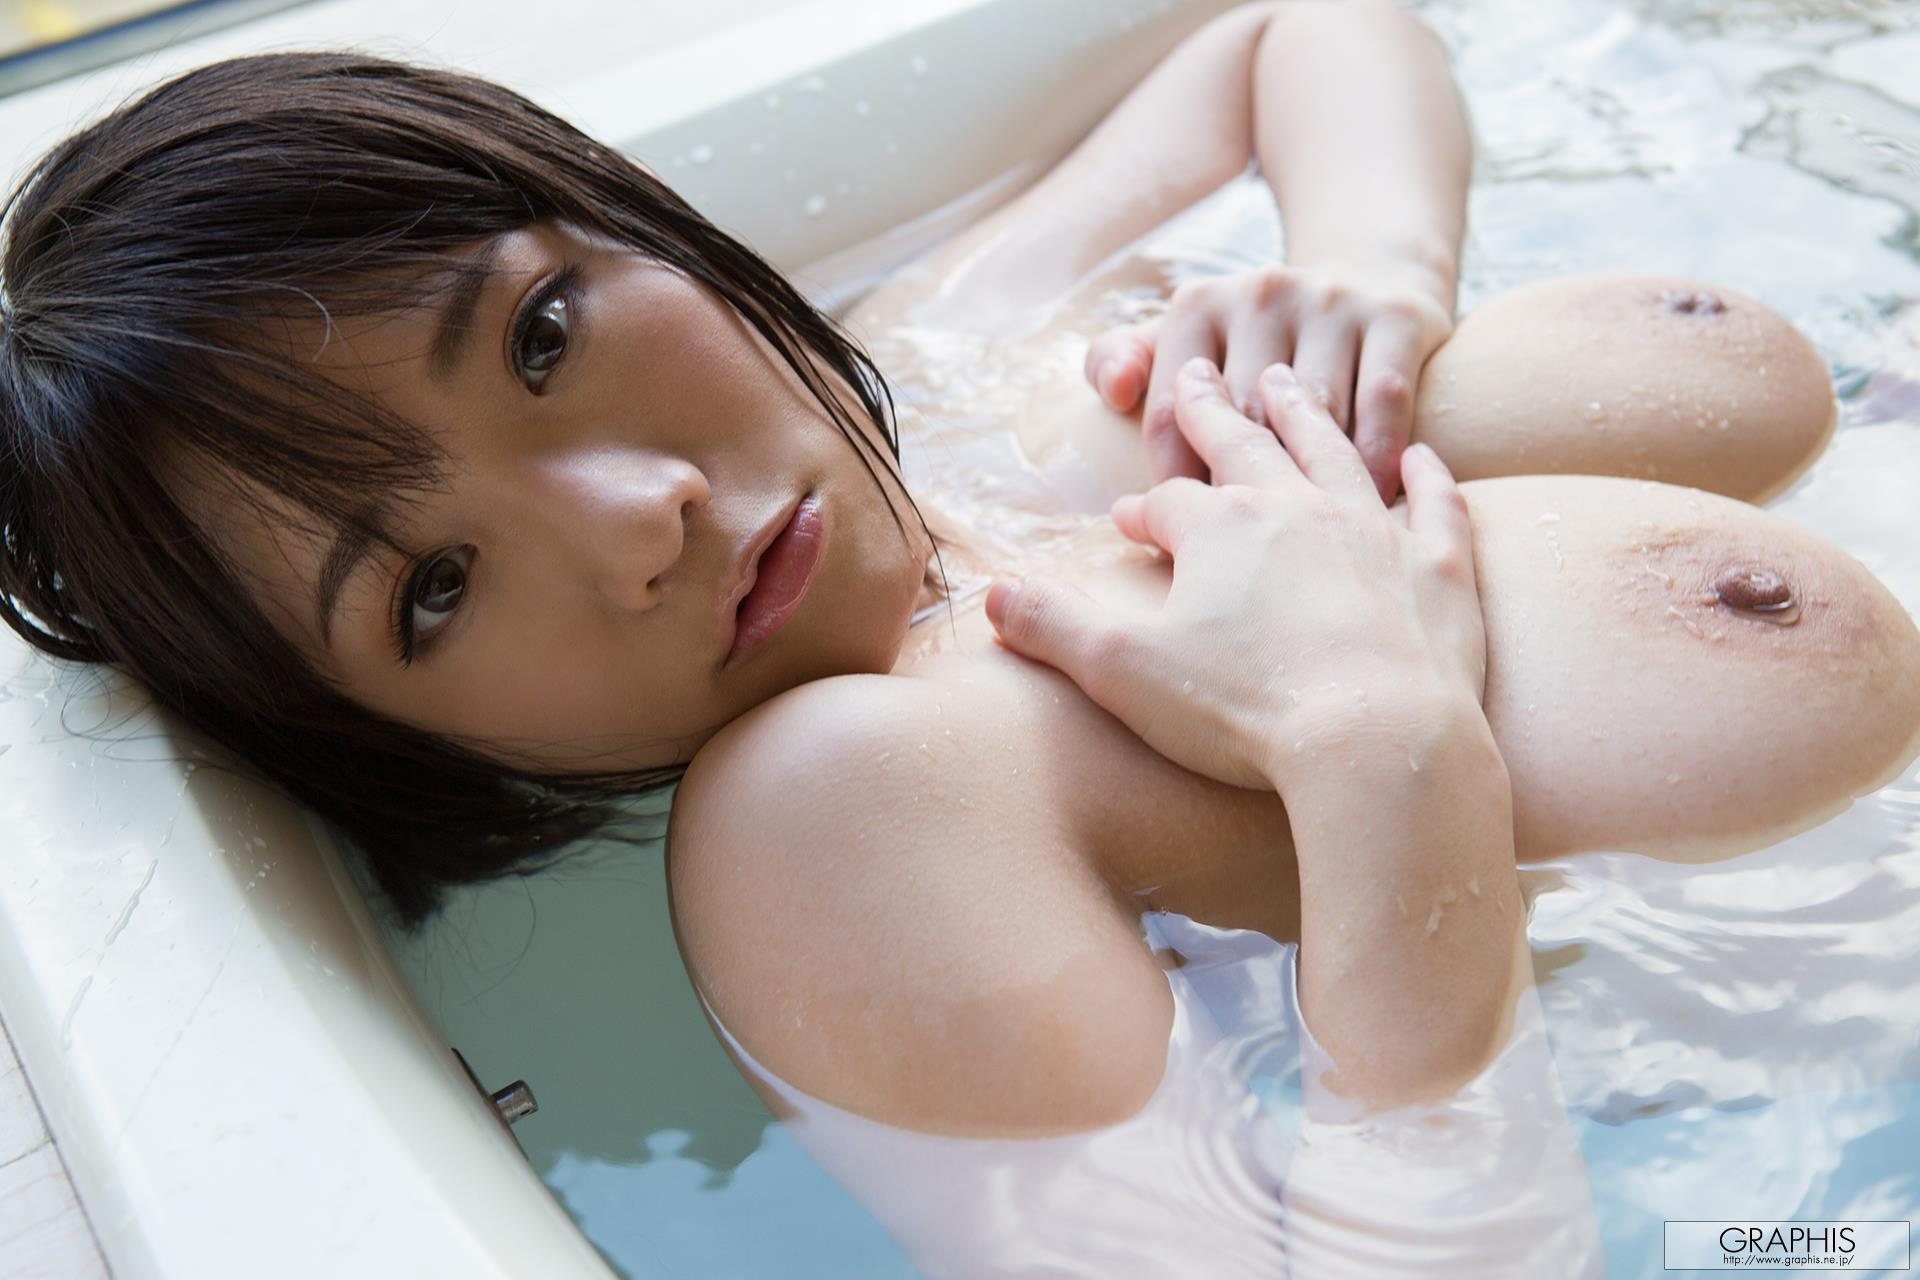 gra_kaho-s057.jpg